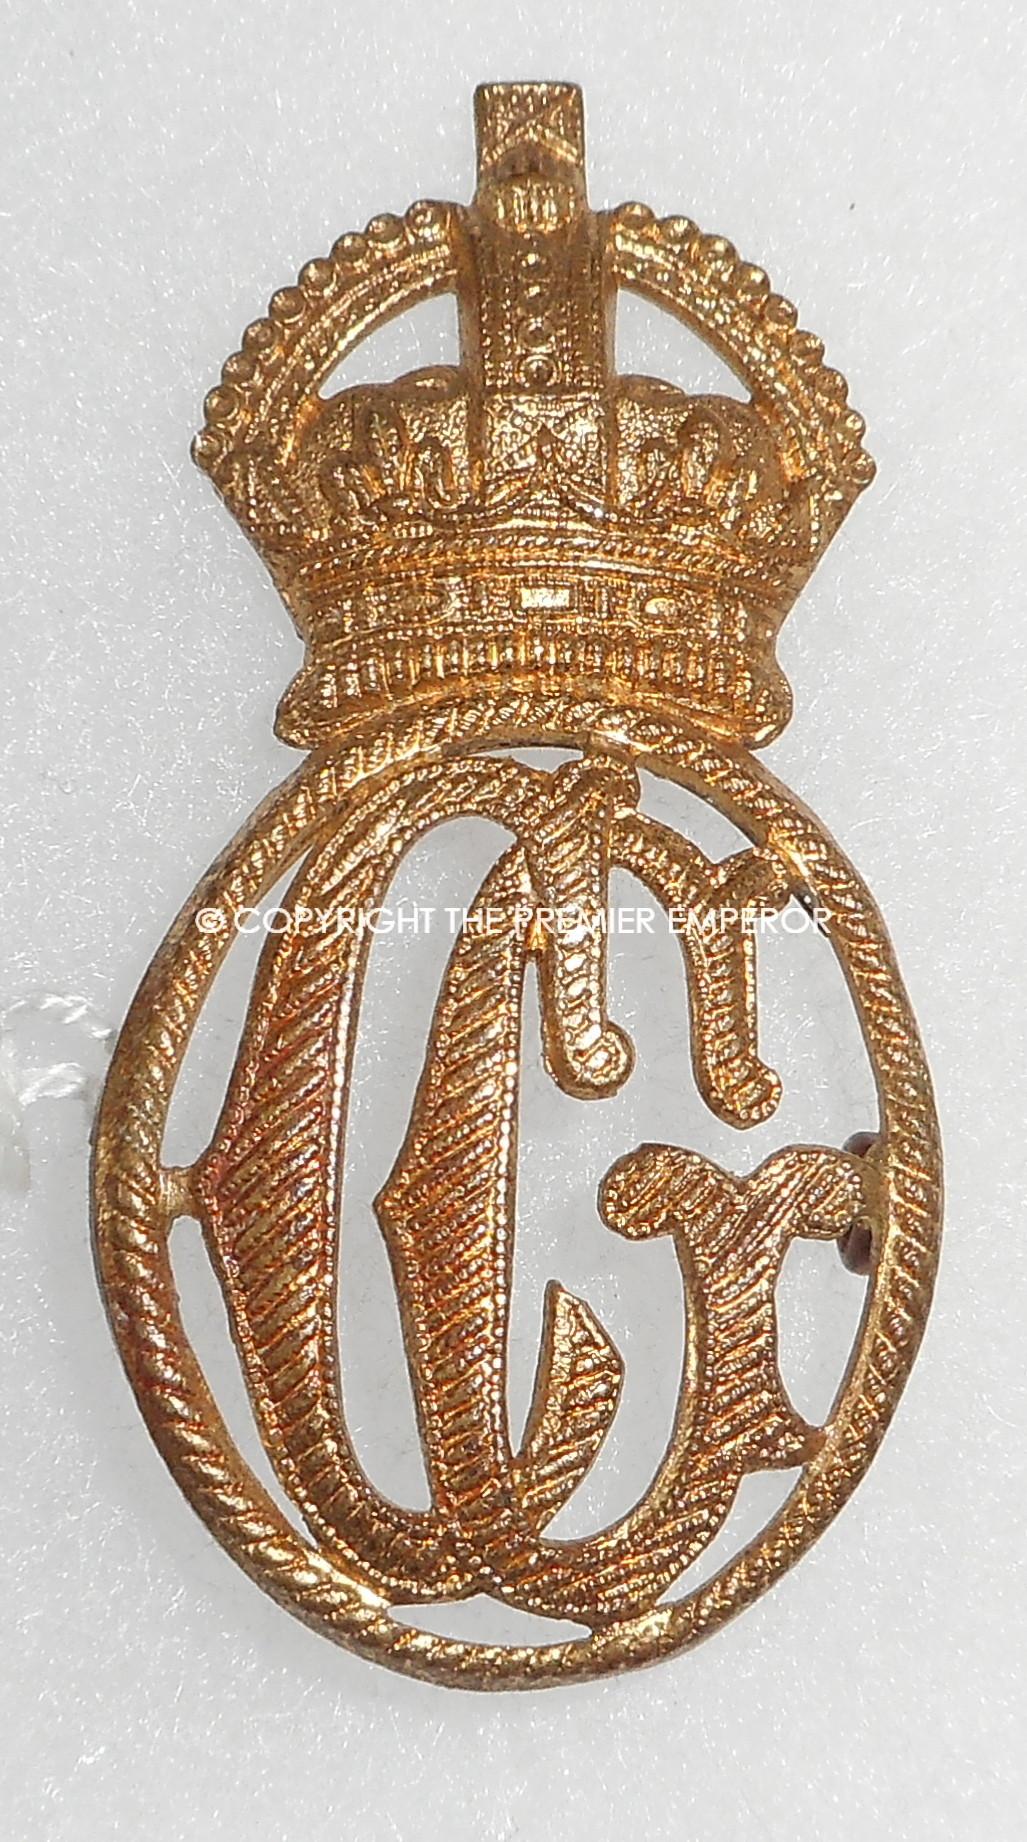 British Her Majesty S Coast Guard Metal Cap Insignia King